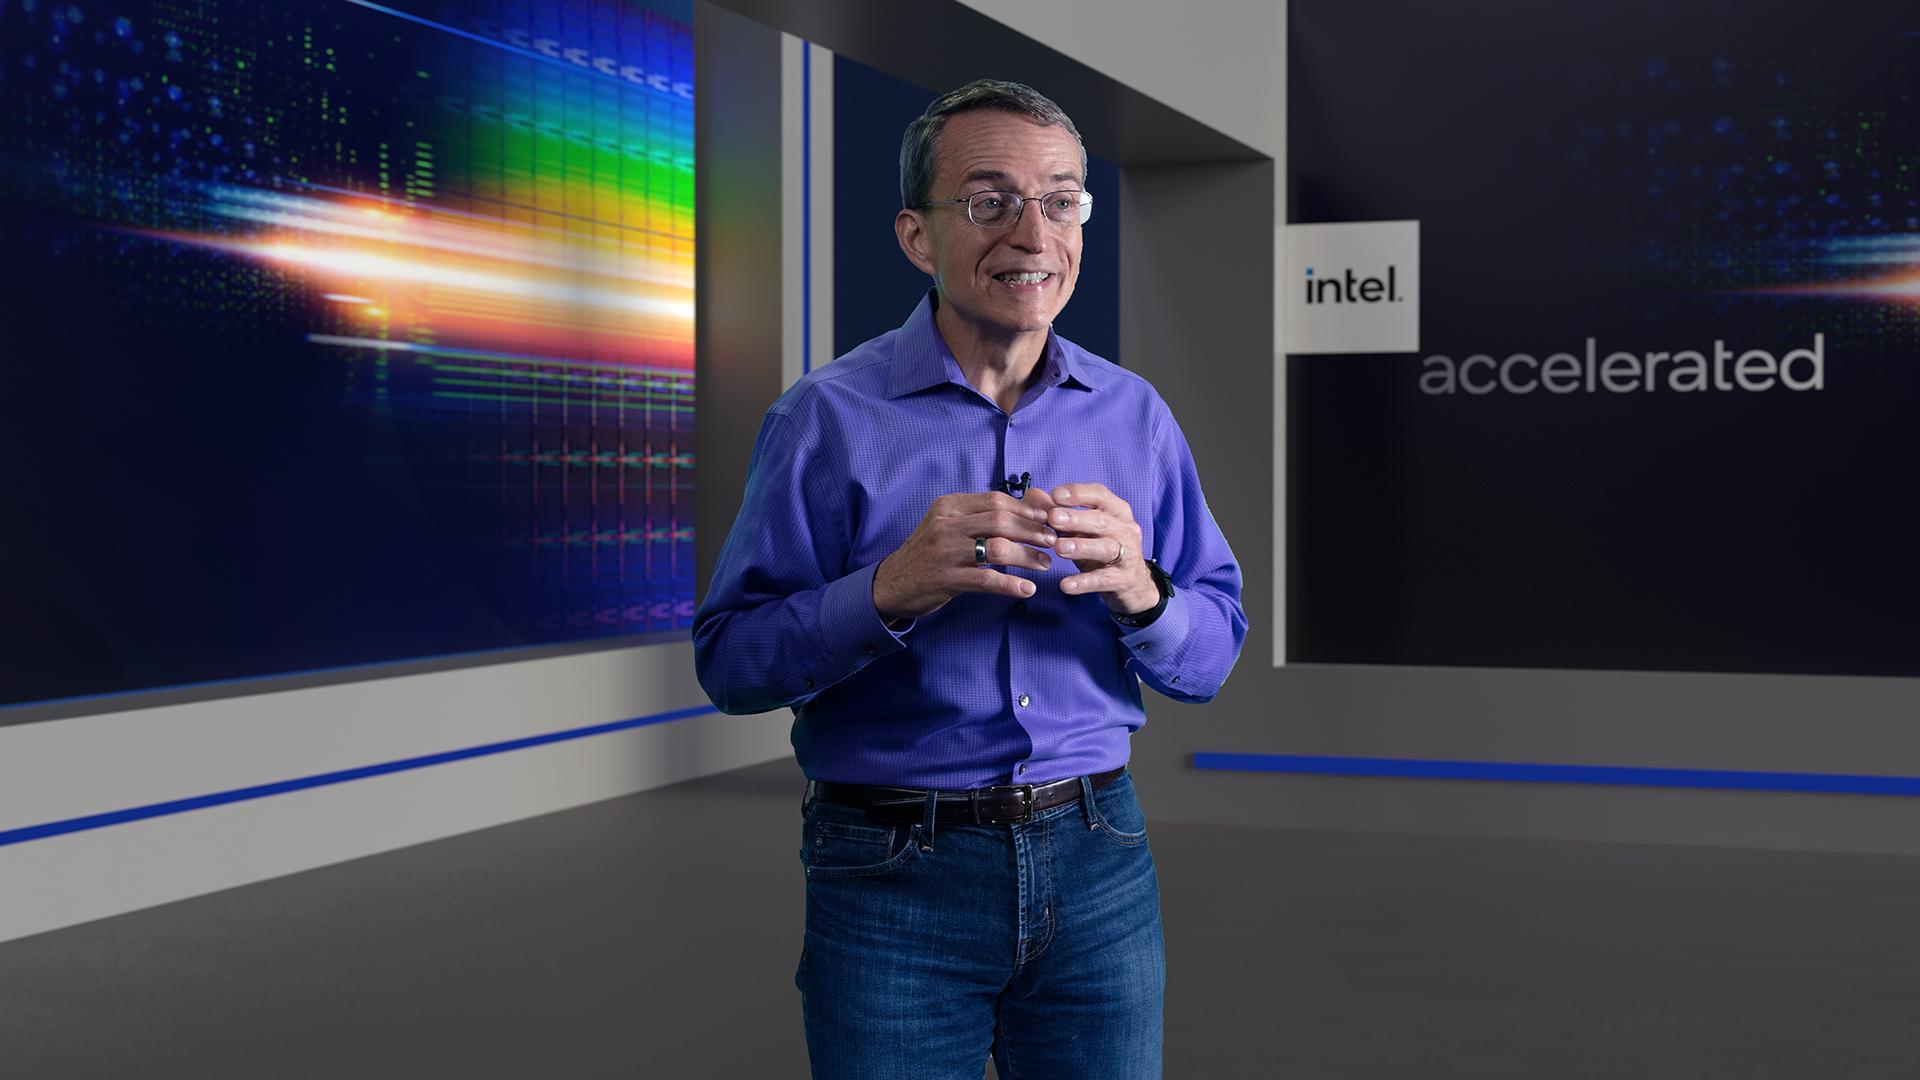 Intel-Accelerated-Pat-Gelsinger-2.jpg.rendition.intel.web.1920.1080